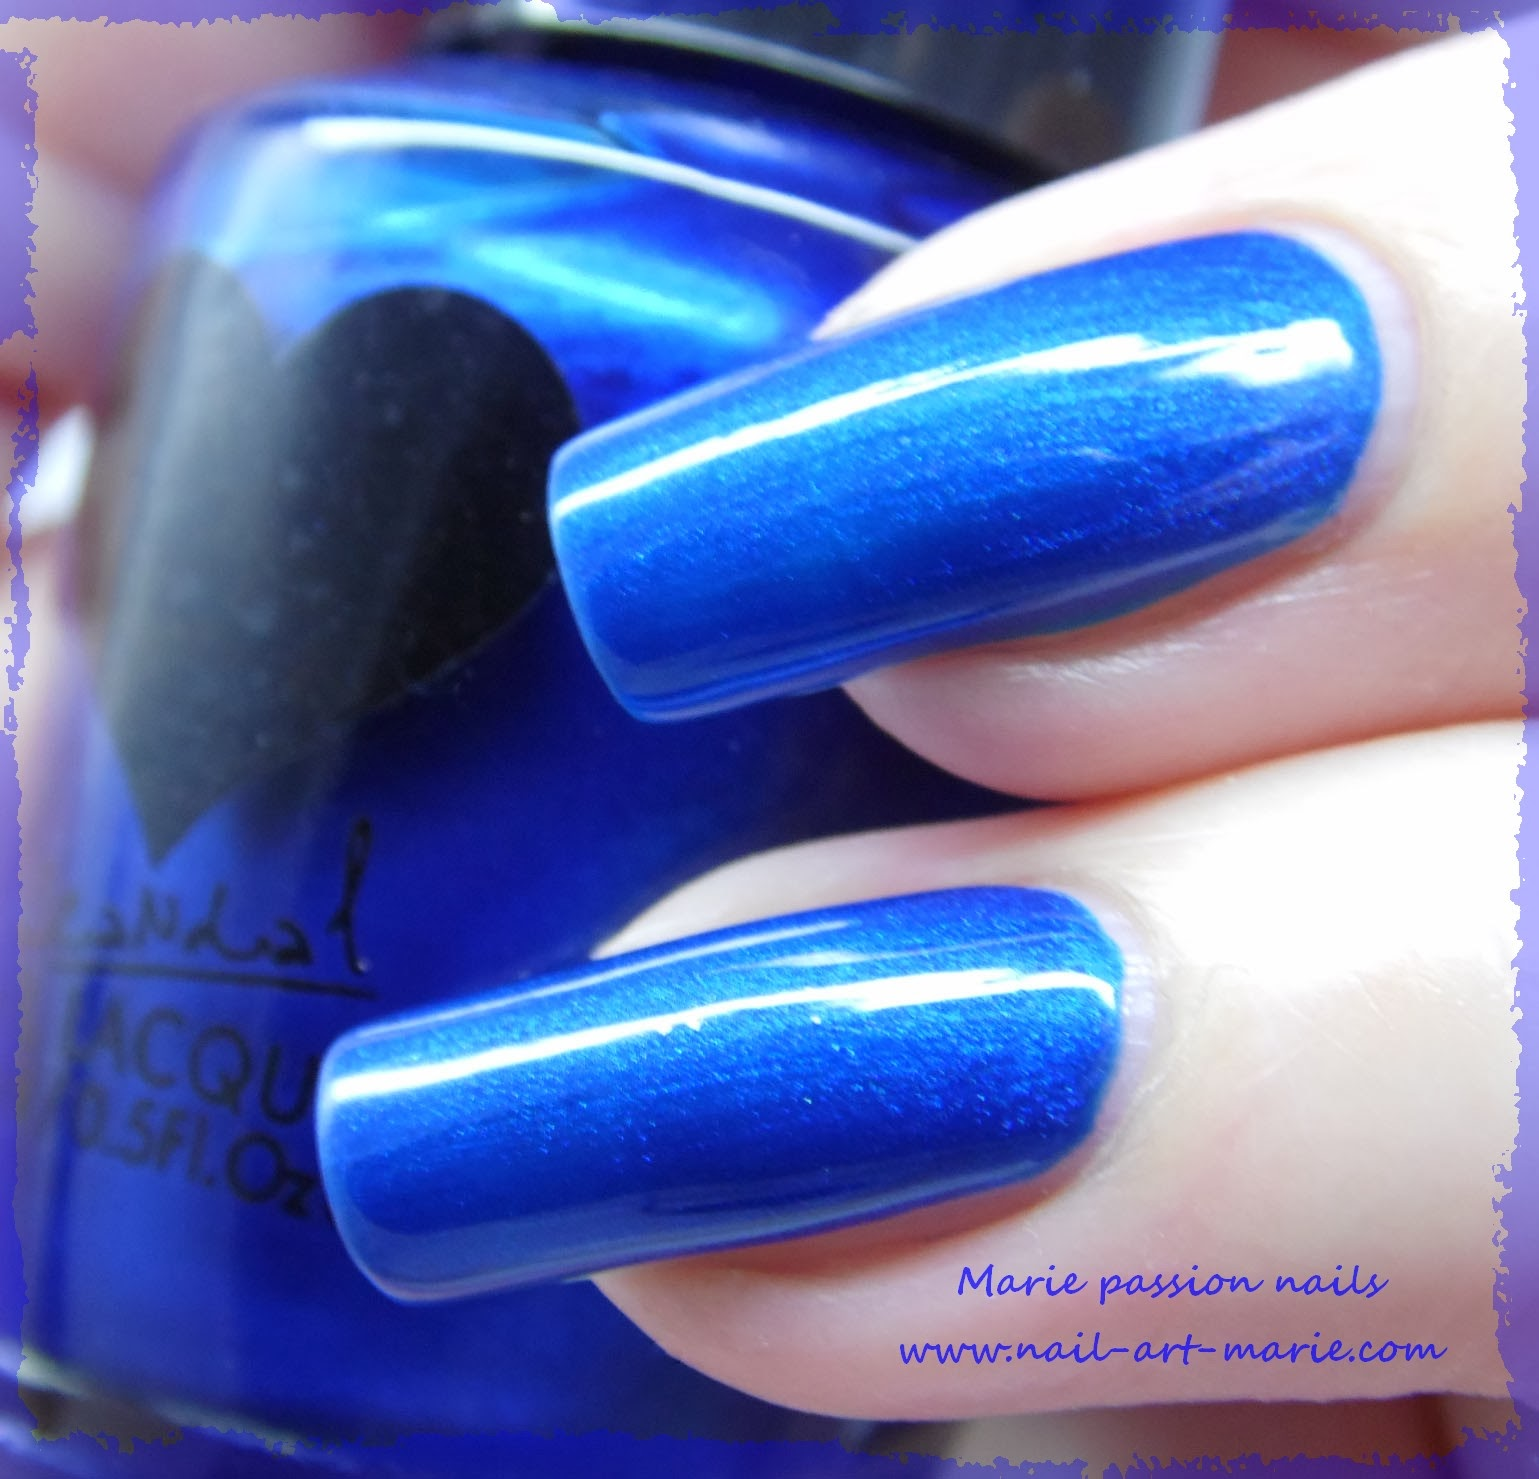 Vernis Scandal Sea Blue Pearl3